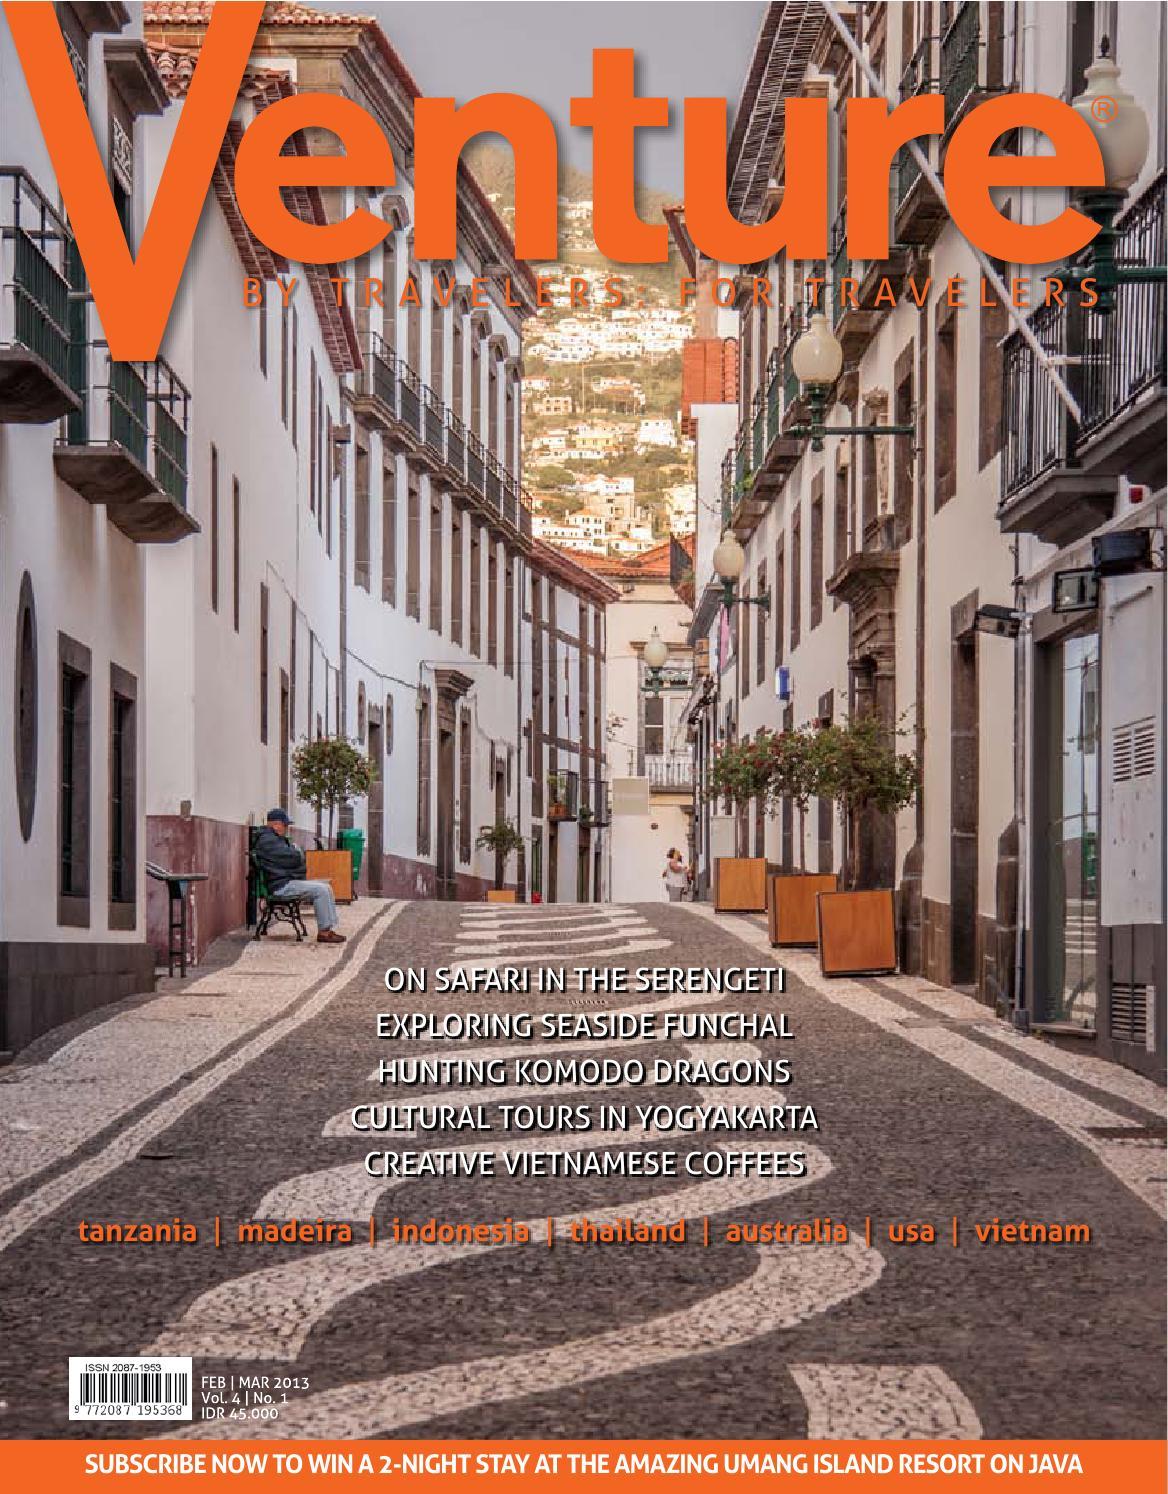 Venture Travel Magazine February 2013 Back Issue By Bold Prints Issuu